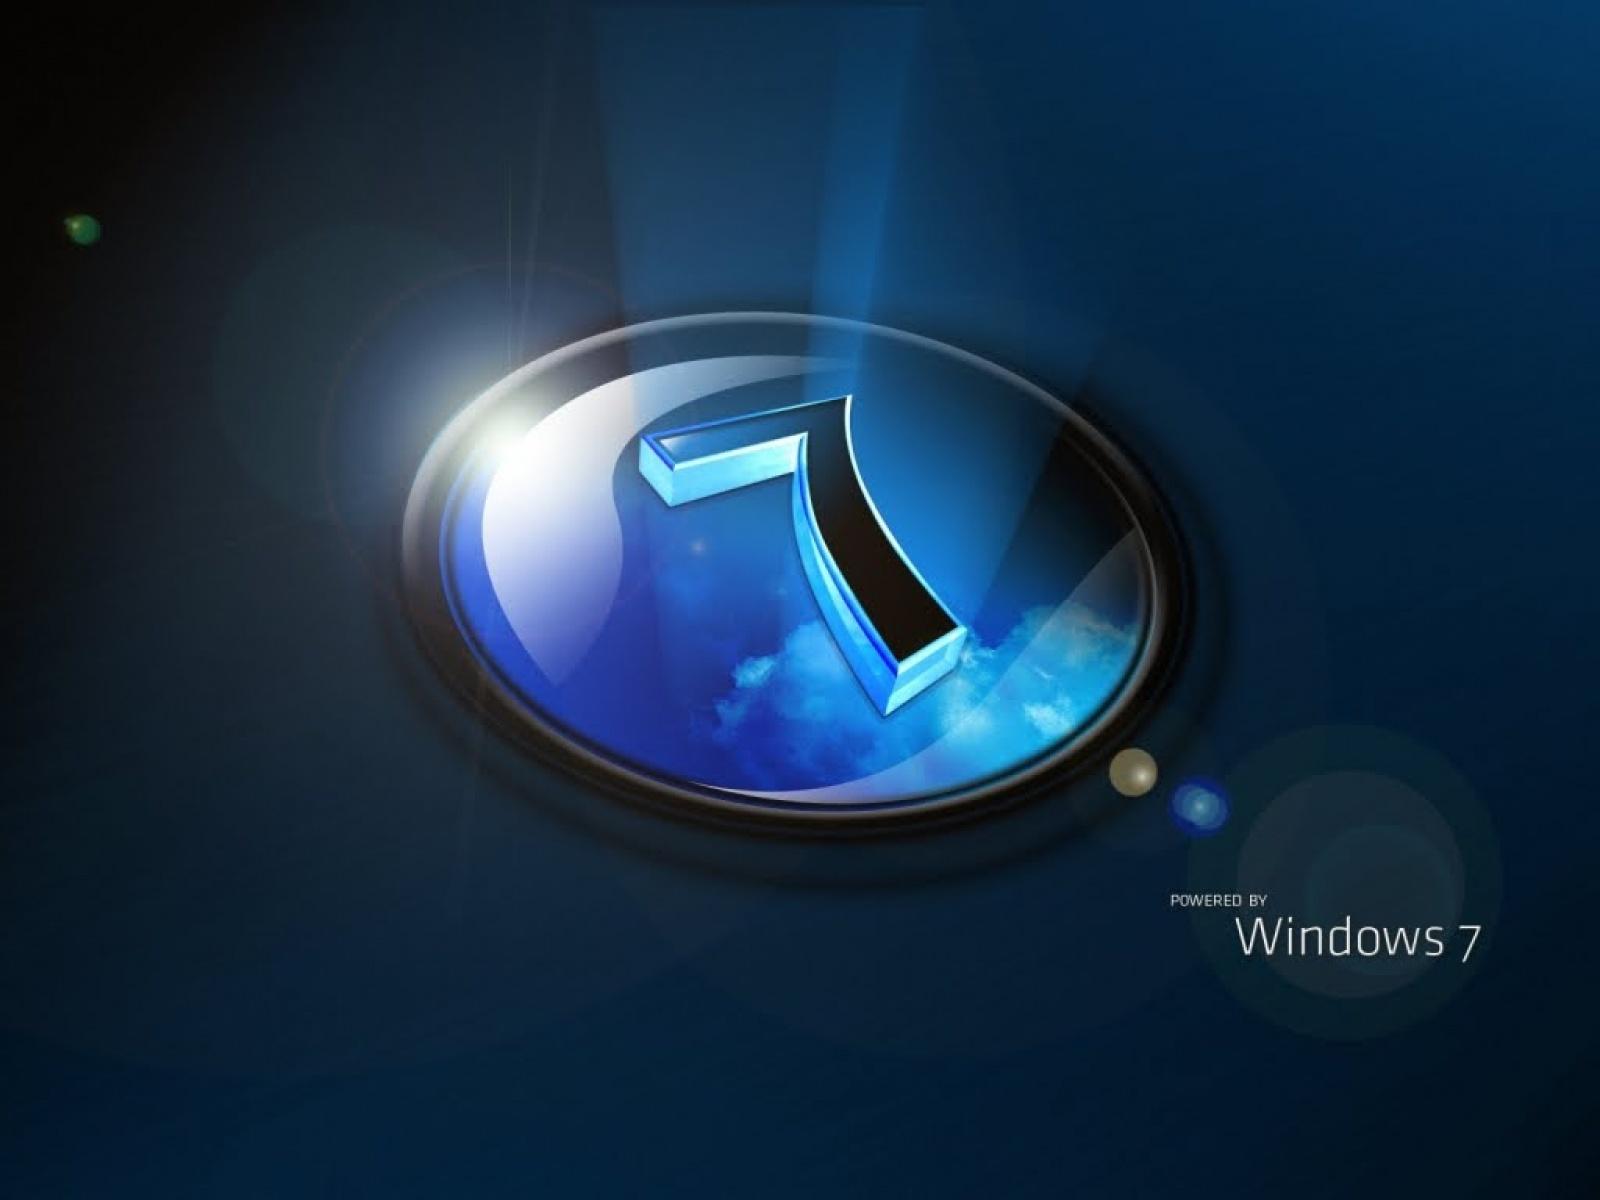 animation hd wallpaper Windows 7 Animated Wallpaper 1600x1200